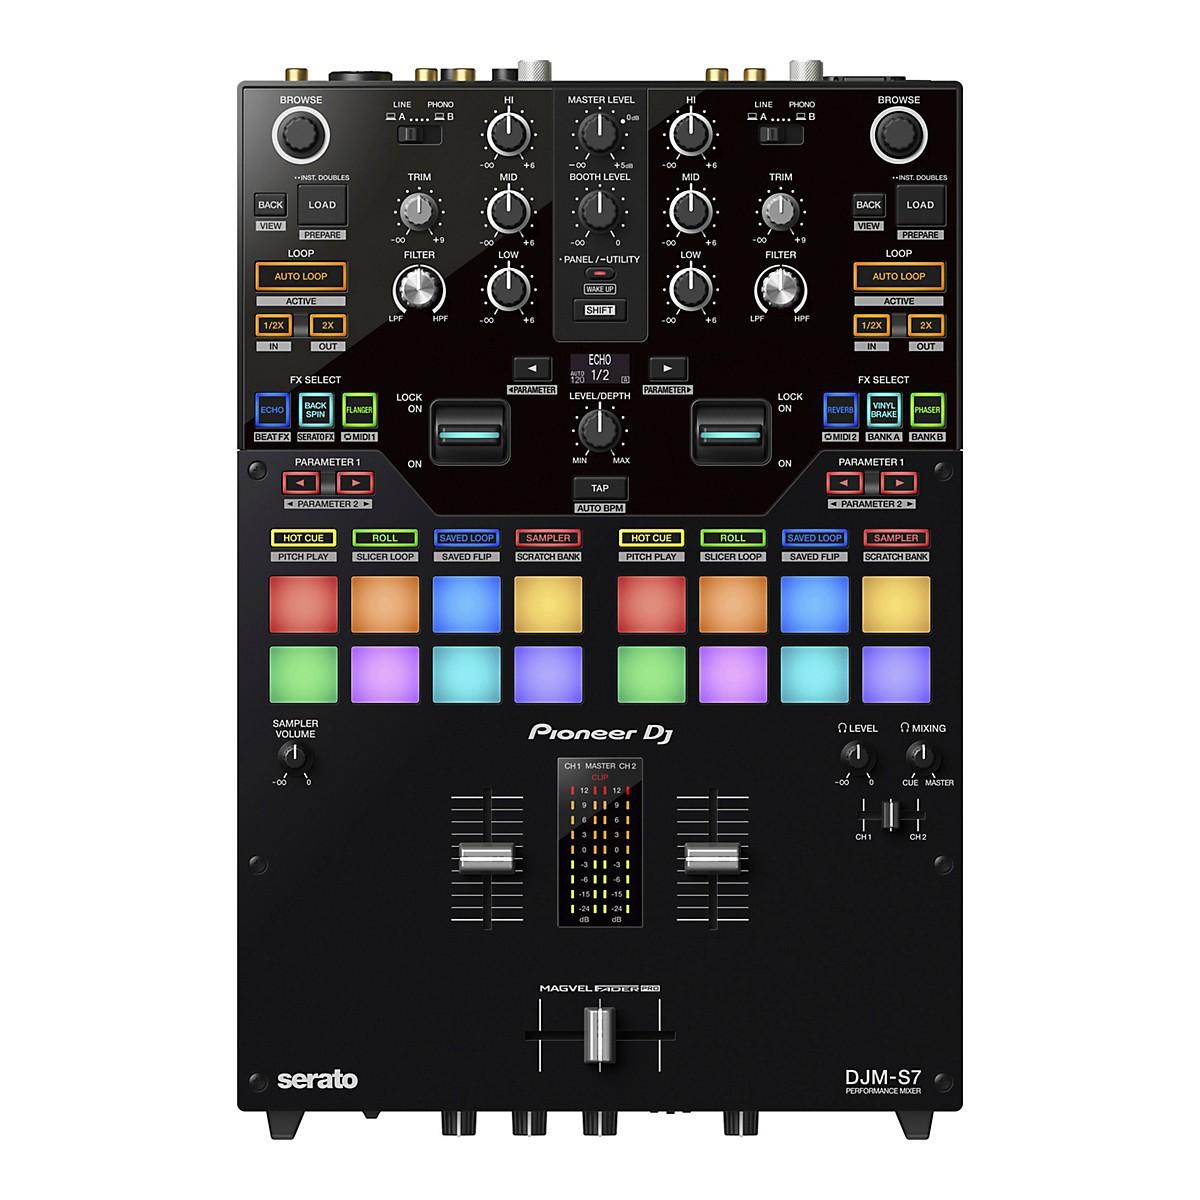 Pioneer DJM-S7 2-Channel Battle Mixer for Serato DJ & rekordbox With Performance Pads